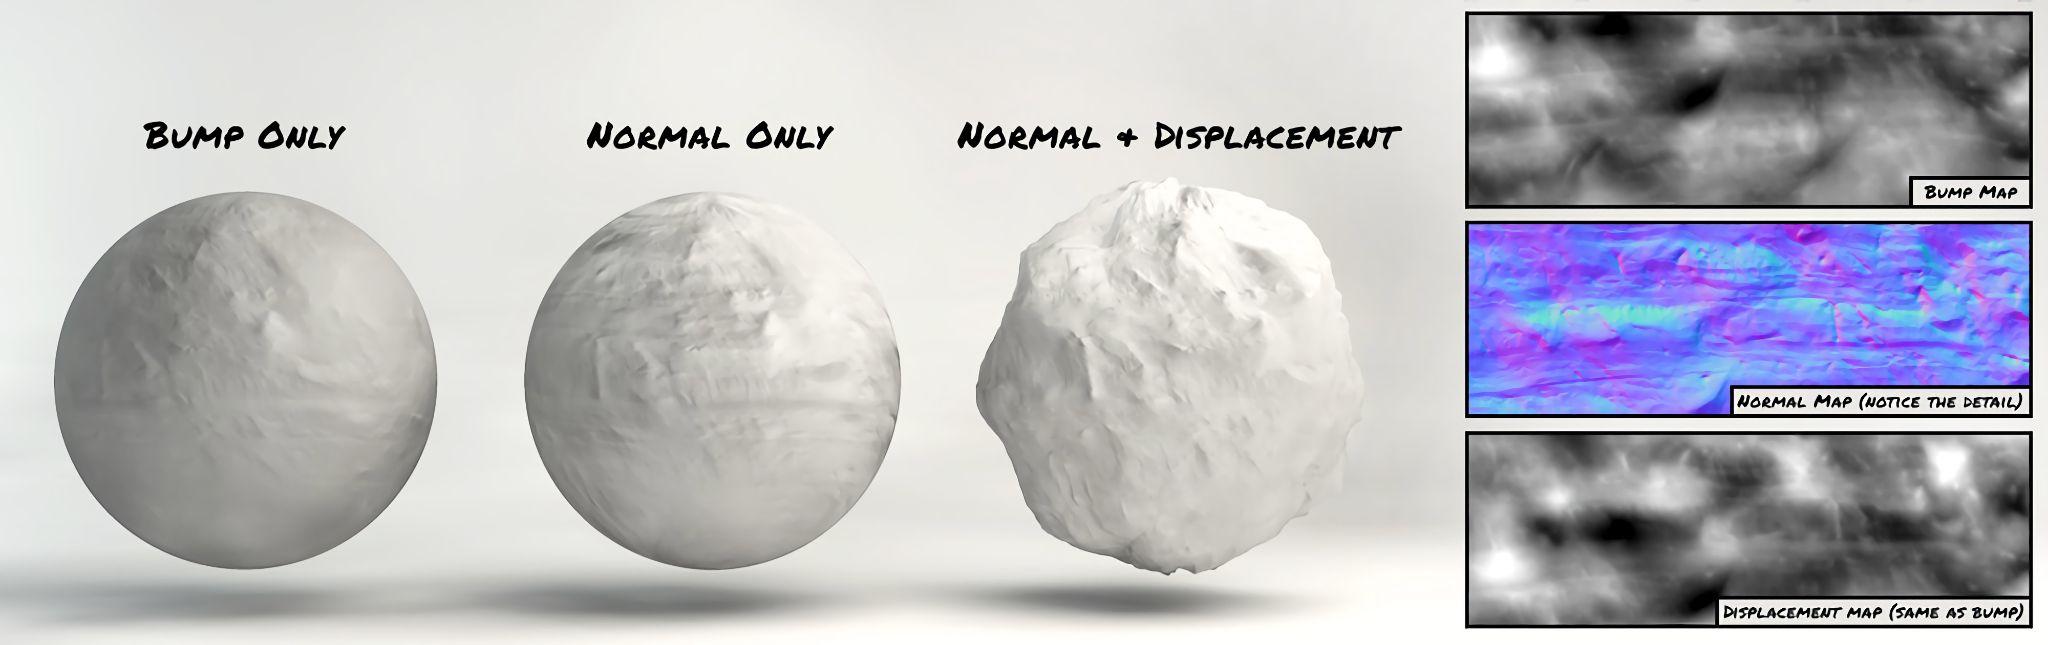 Bump map vs Normal map vs Displacement map